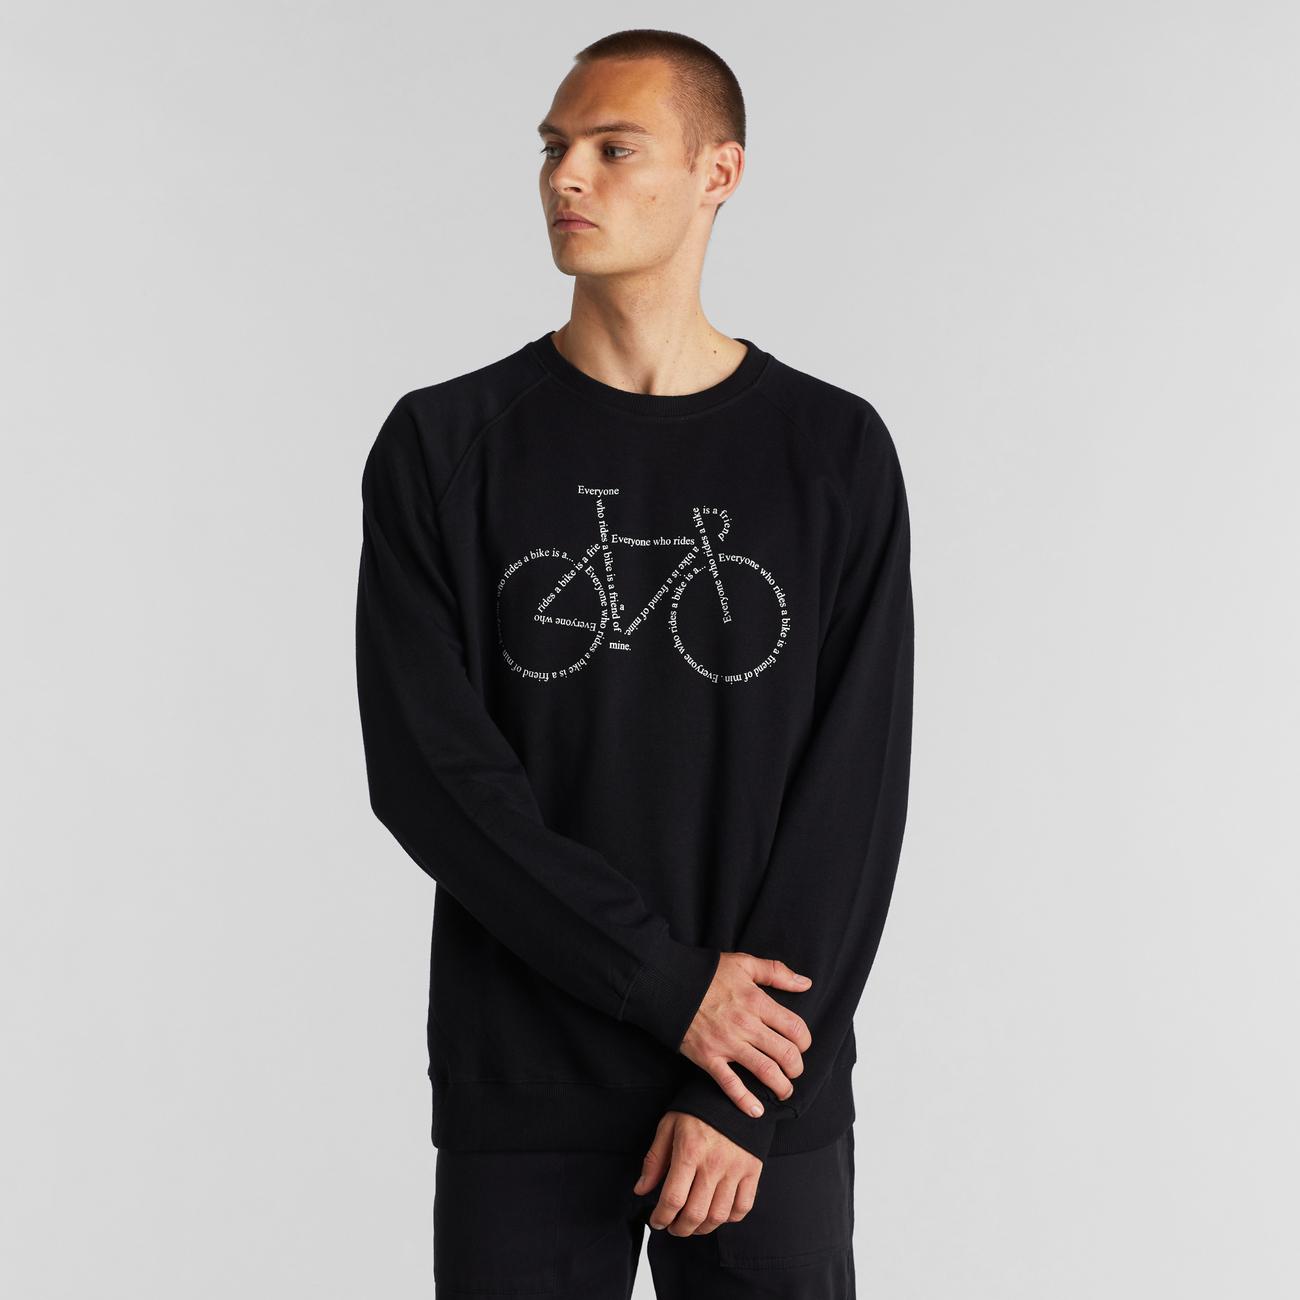 Sweatshirt Malmoe Text Bike